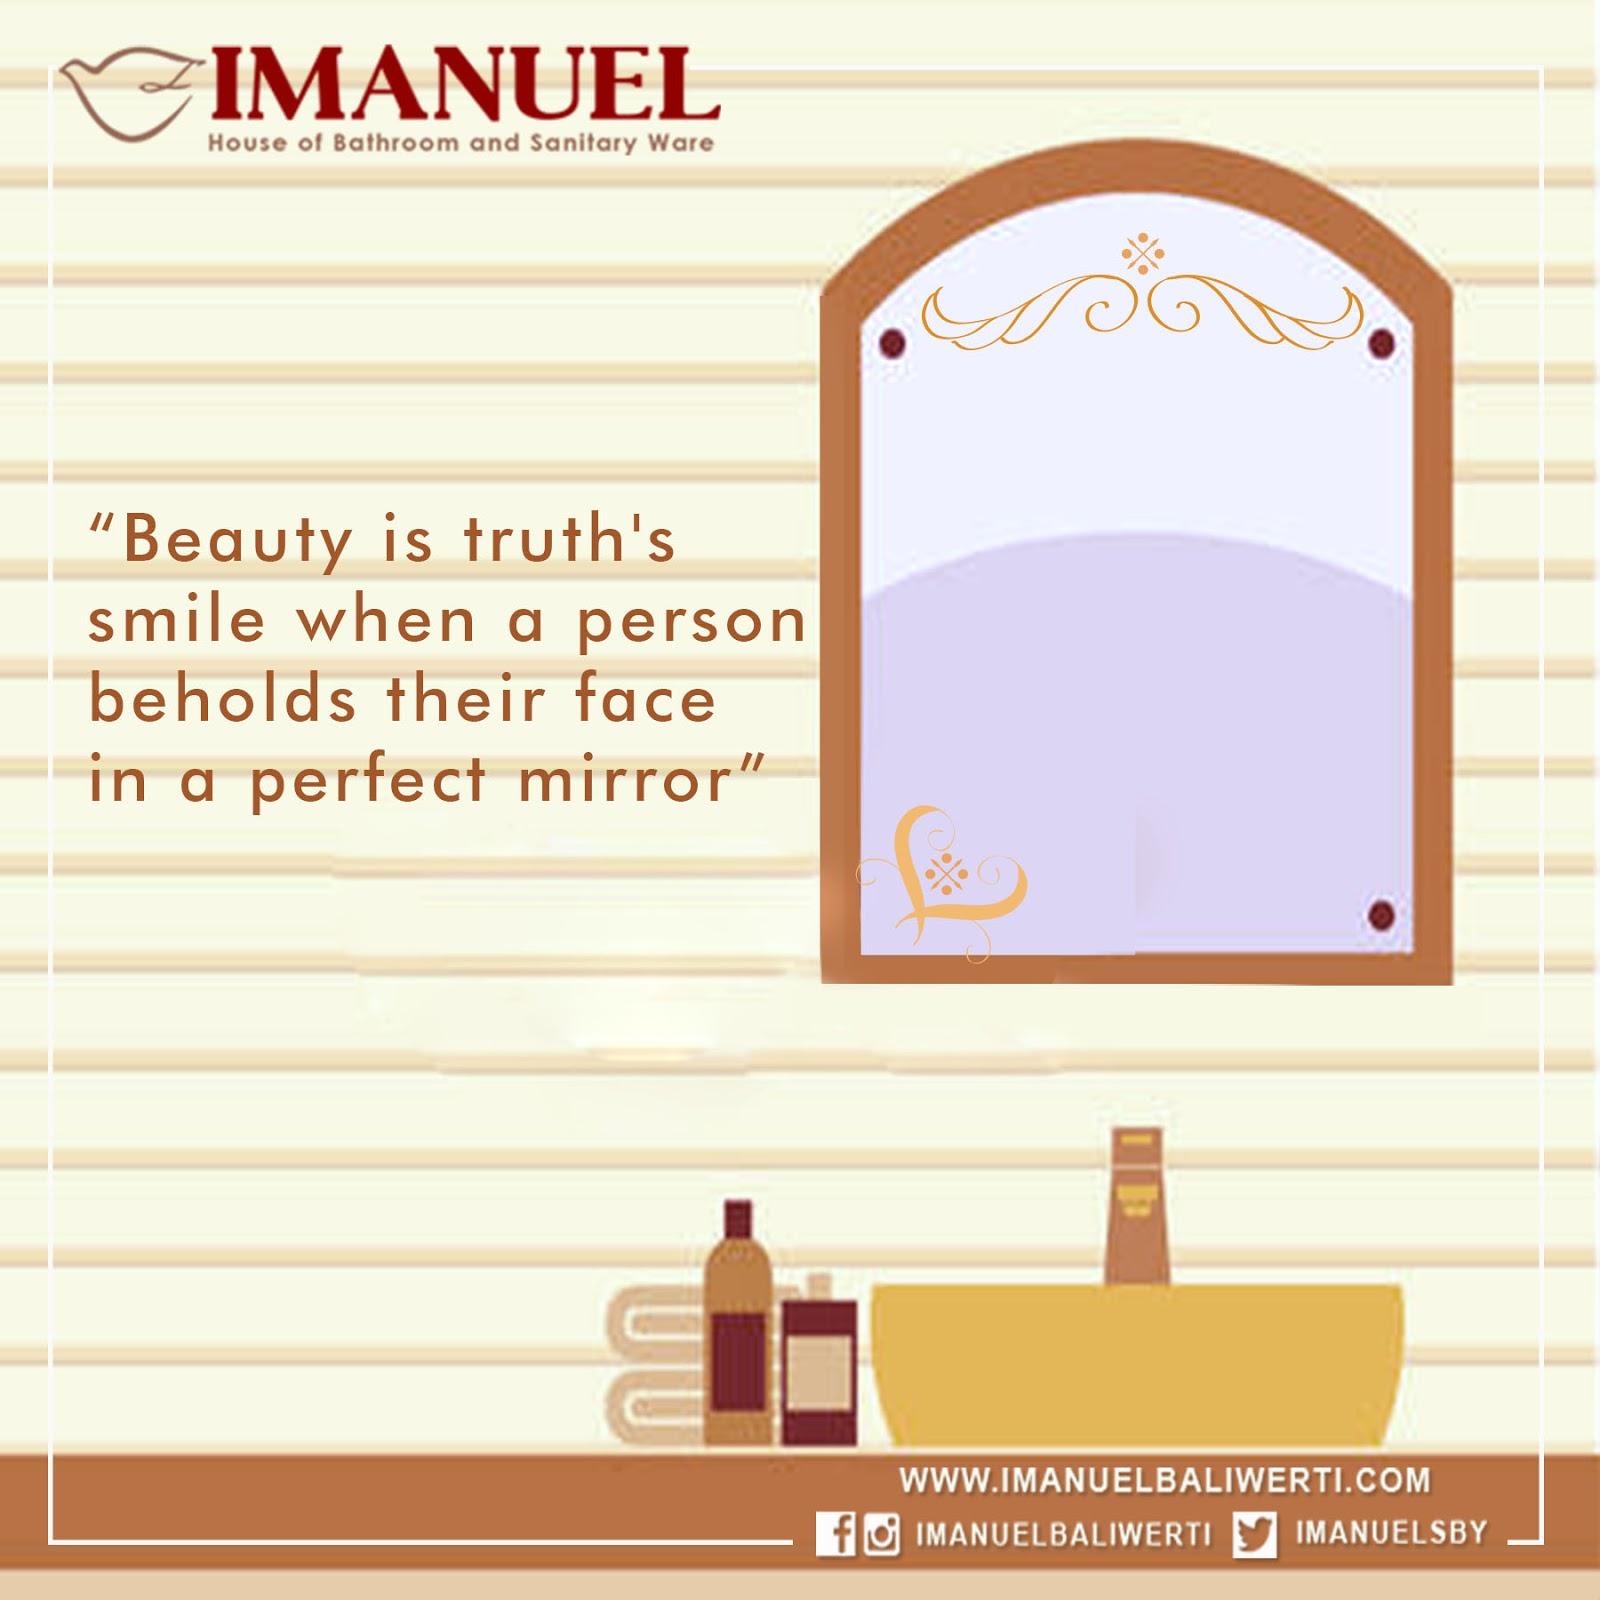 jual kaca cermin hias rumah surabaya imanuelbaliwerti